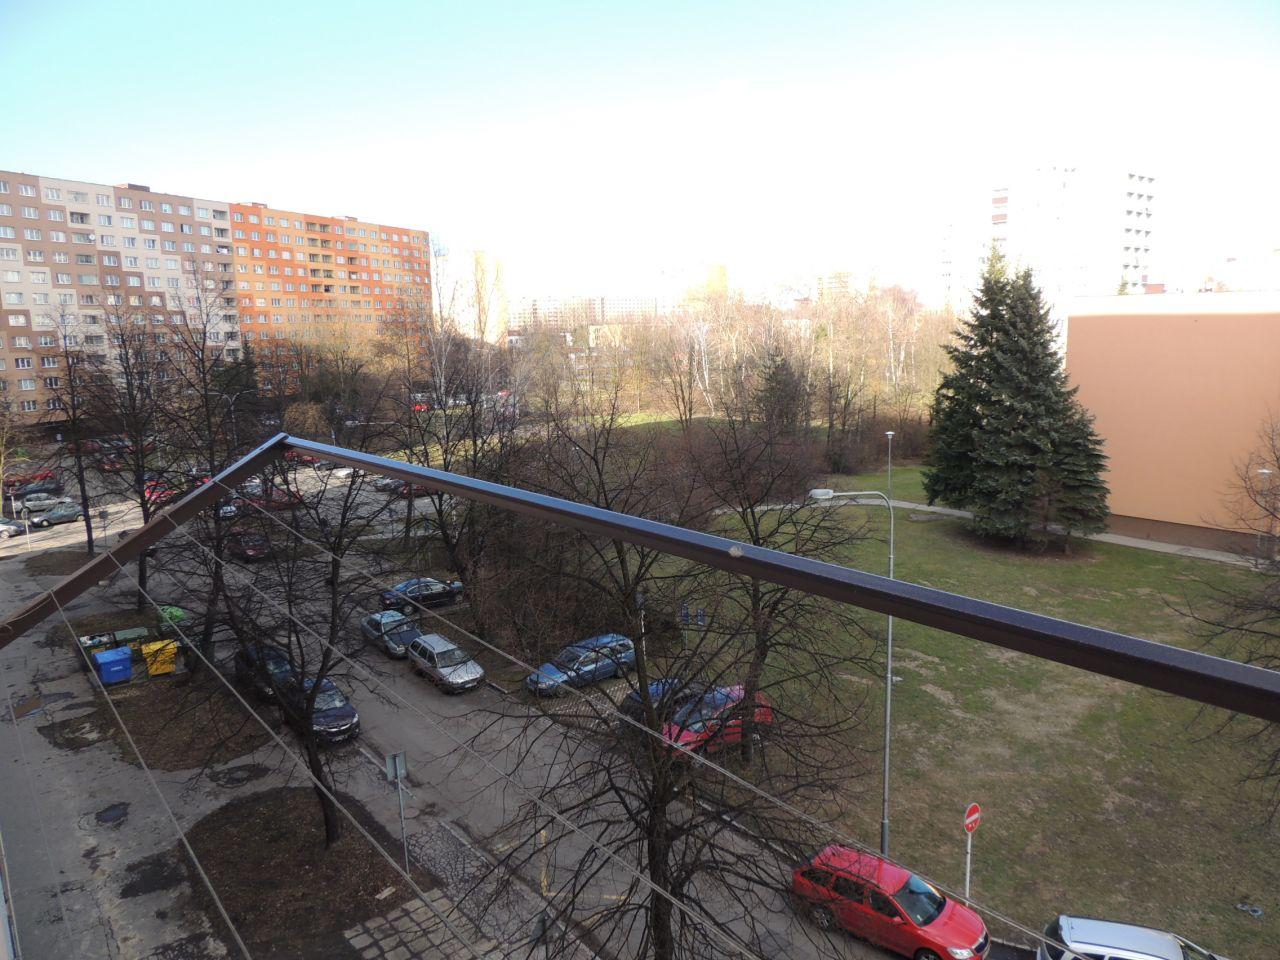 Pronájem bytu 2+1 50 m2, ul. Františka Hajdy 1241/32,  Ostrava